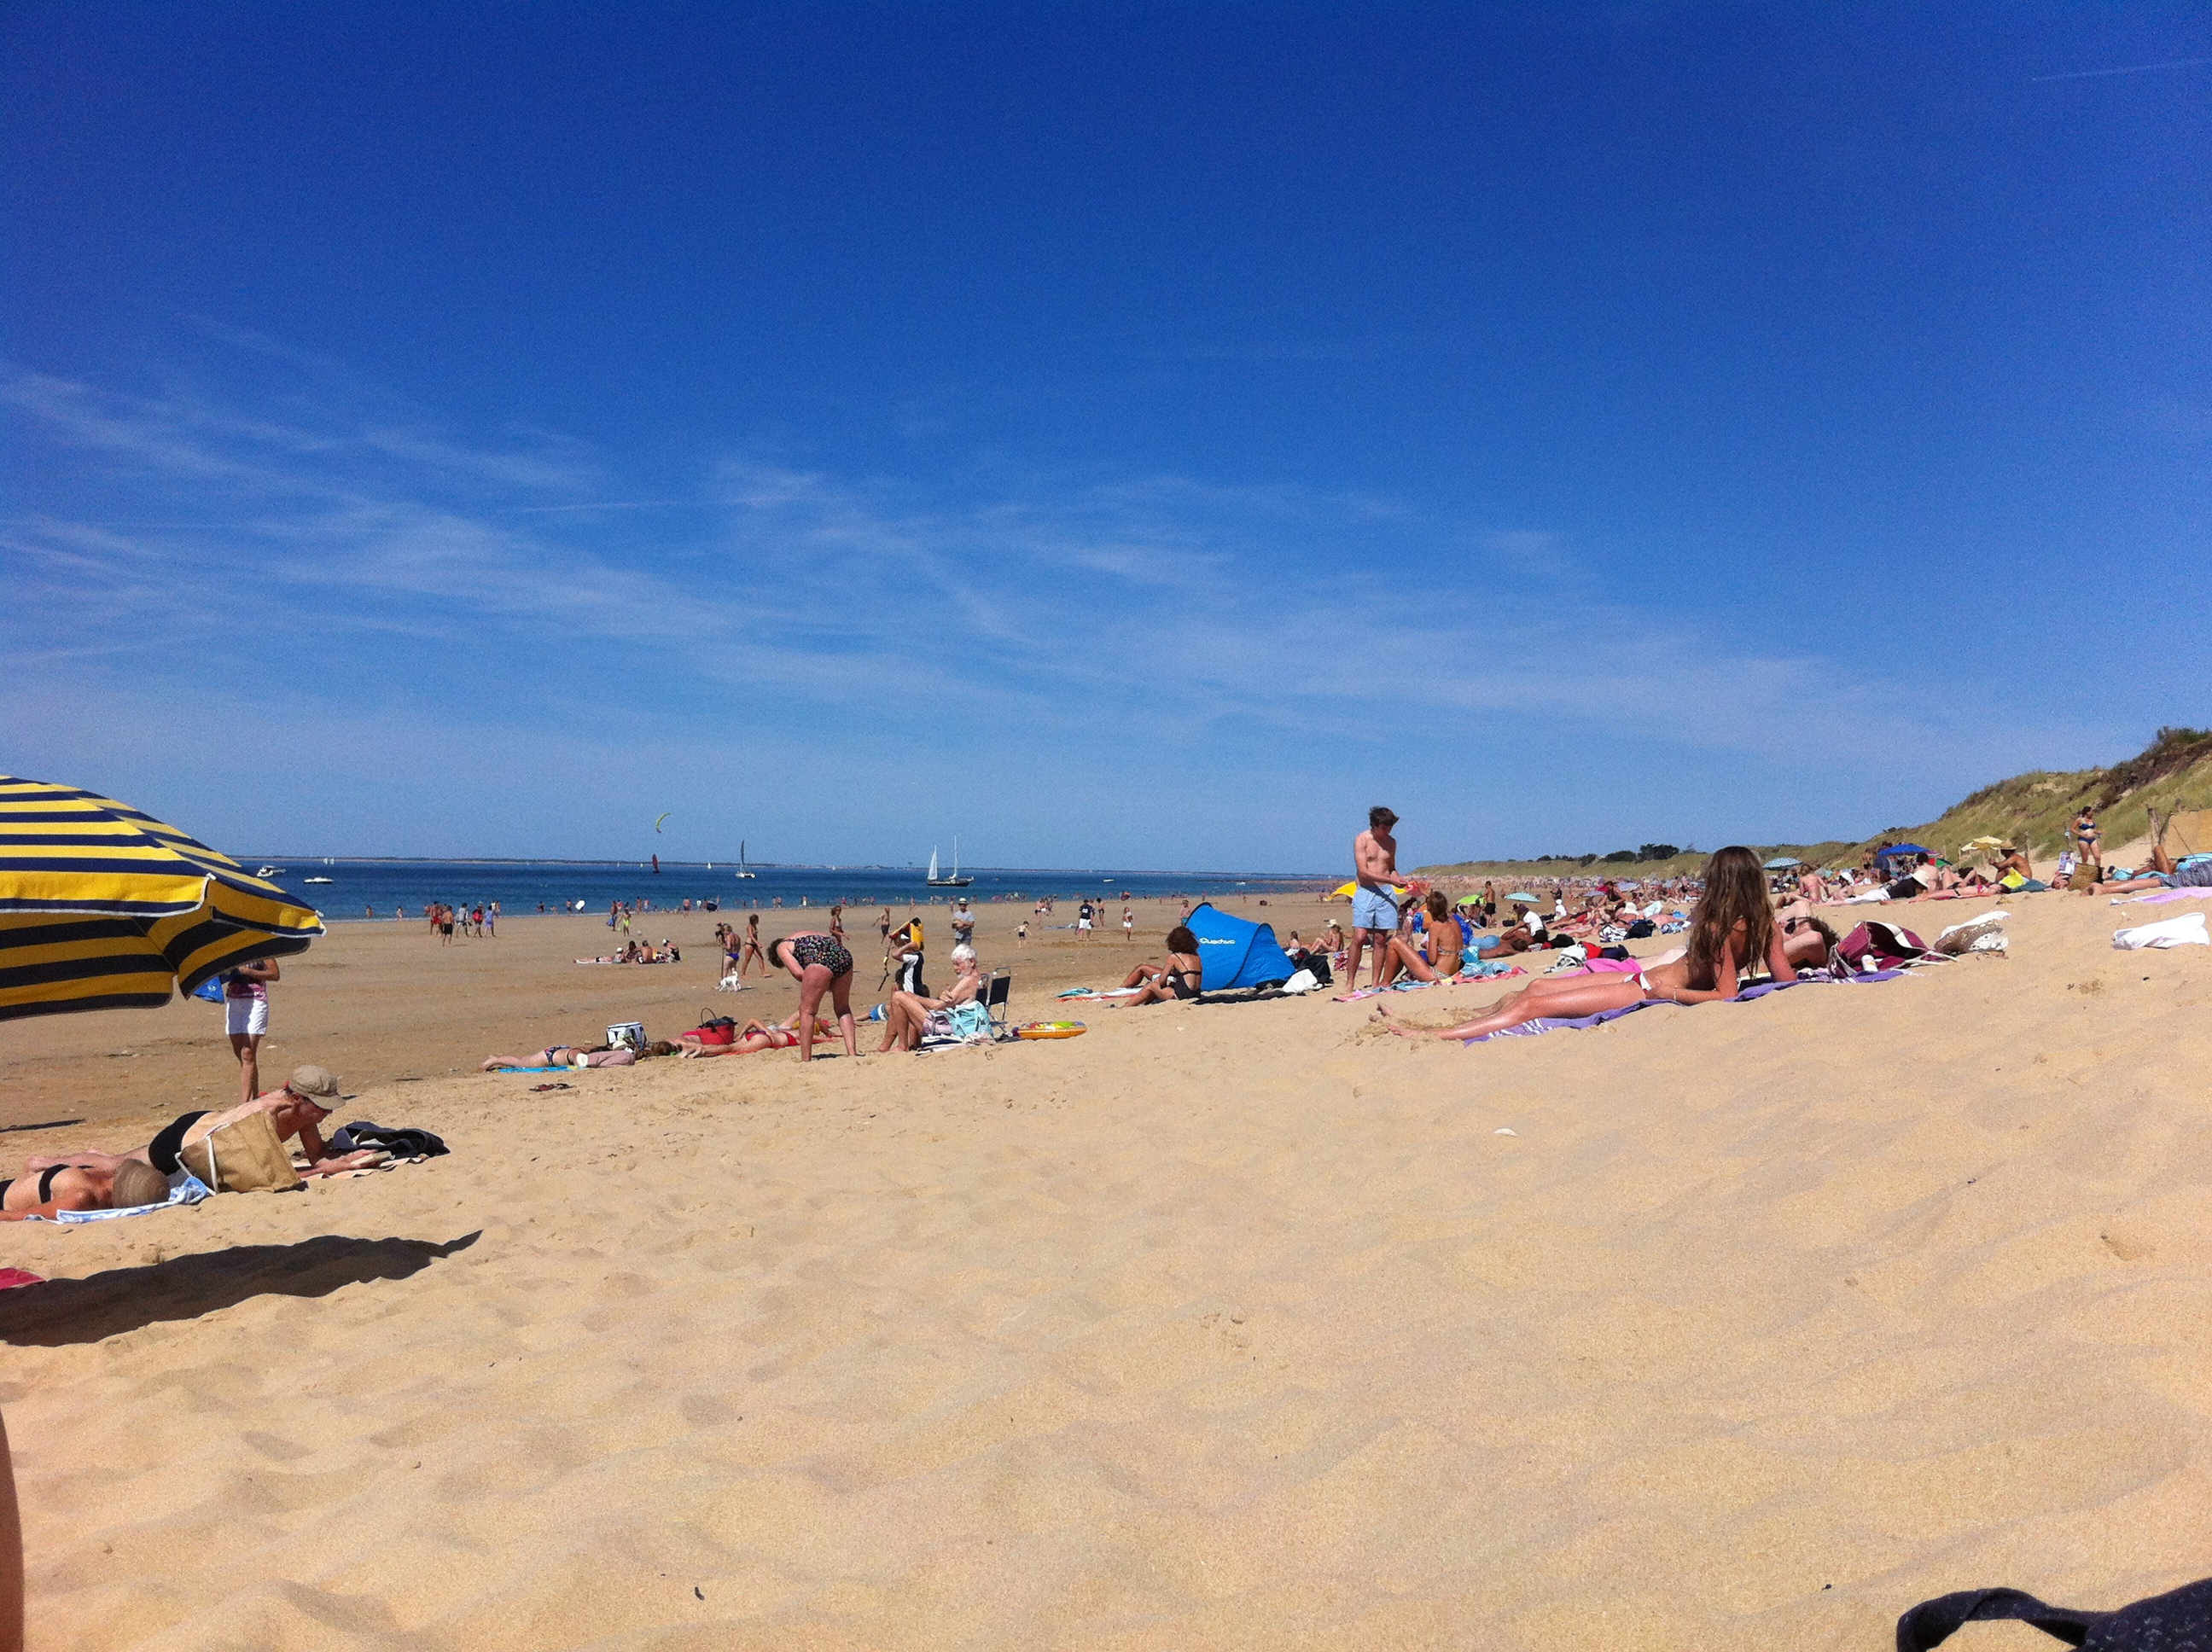 Après-midi à la plage